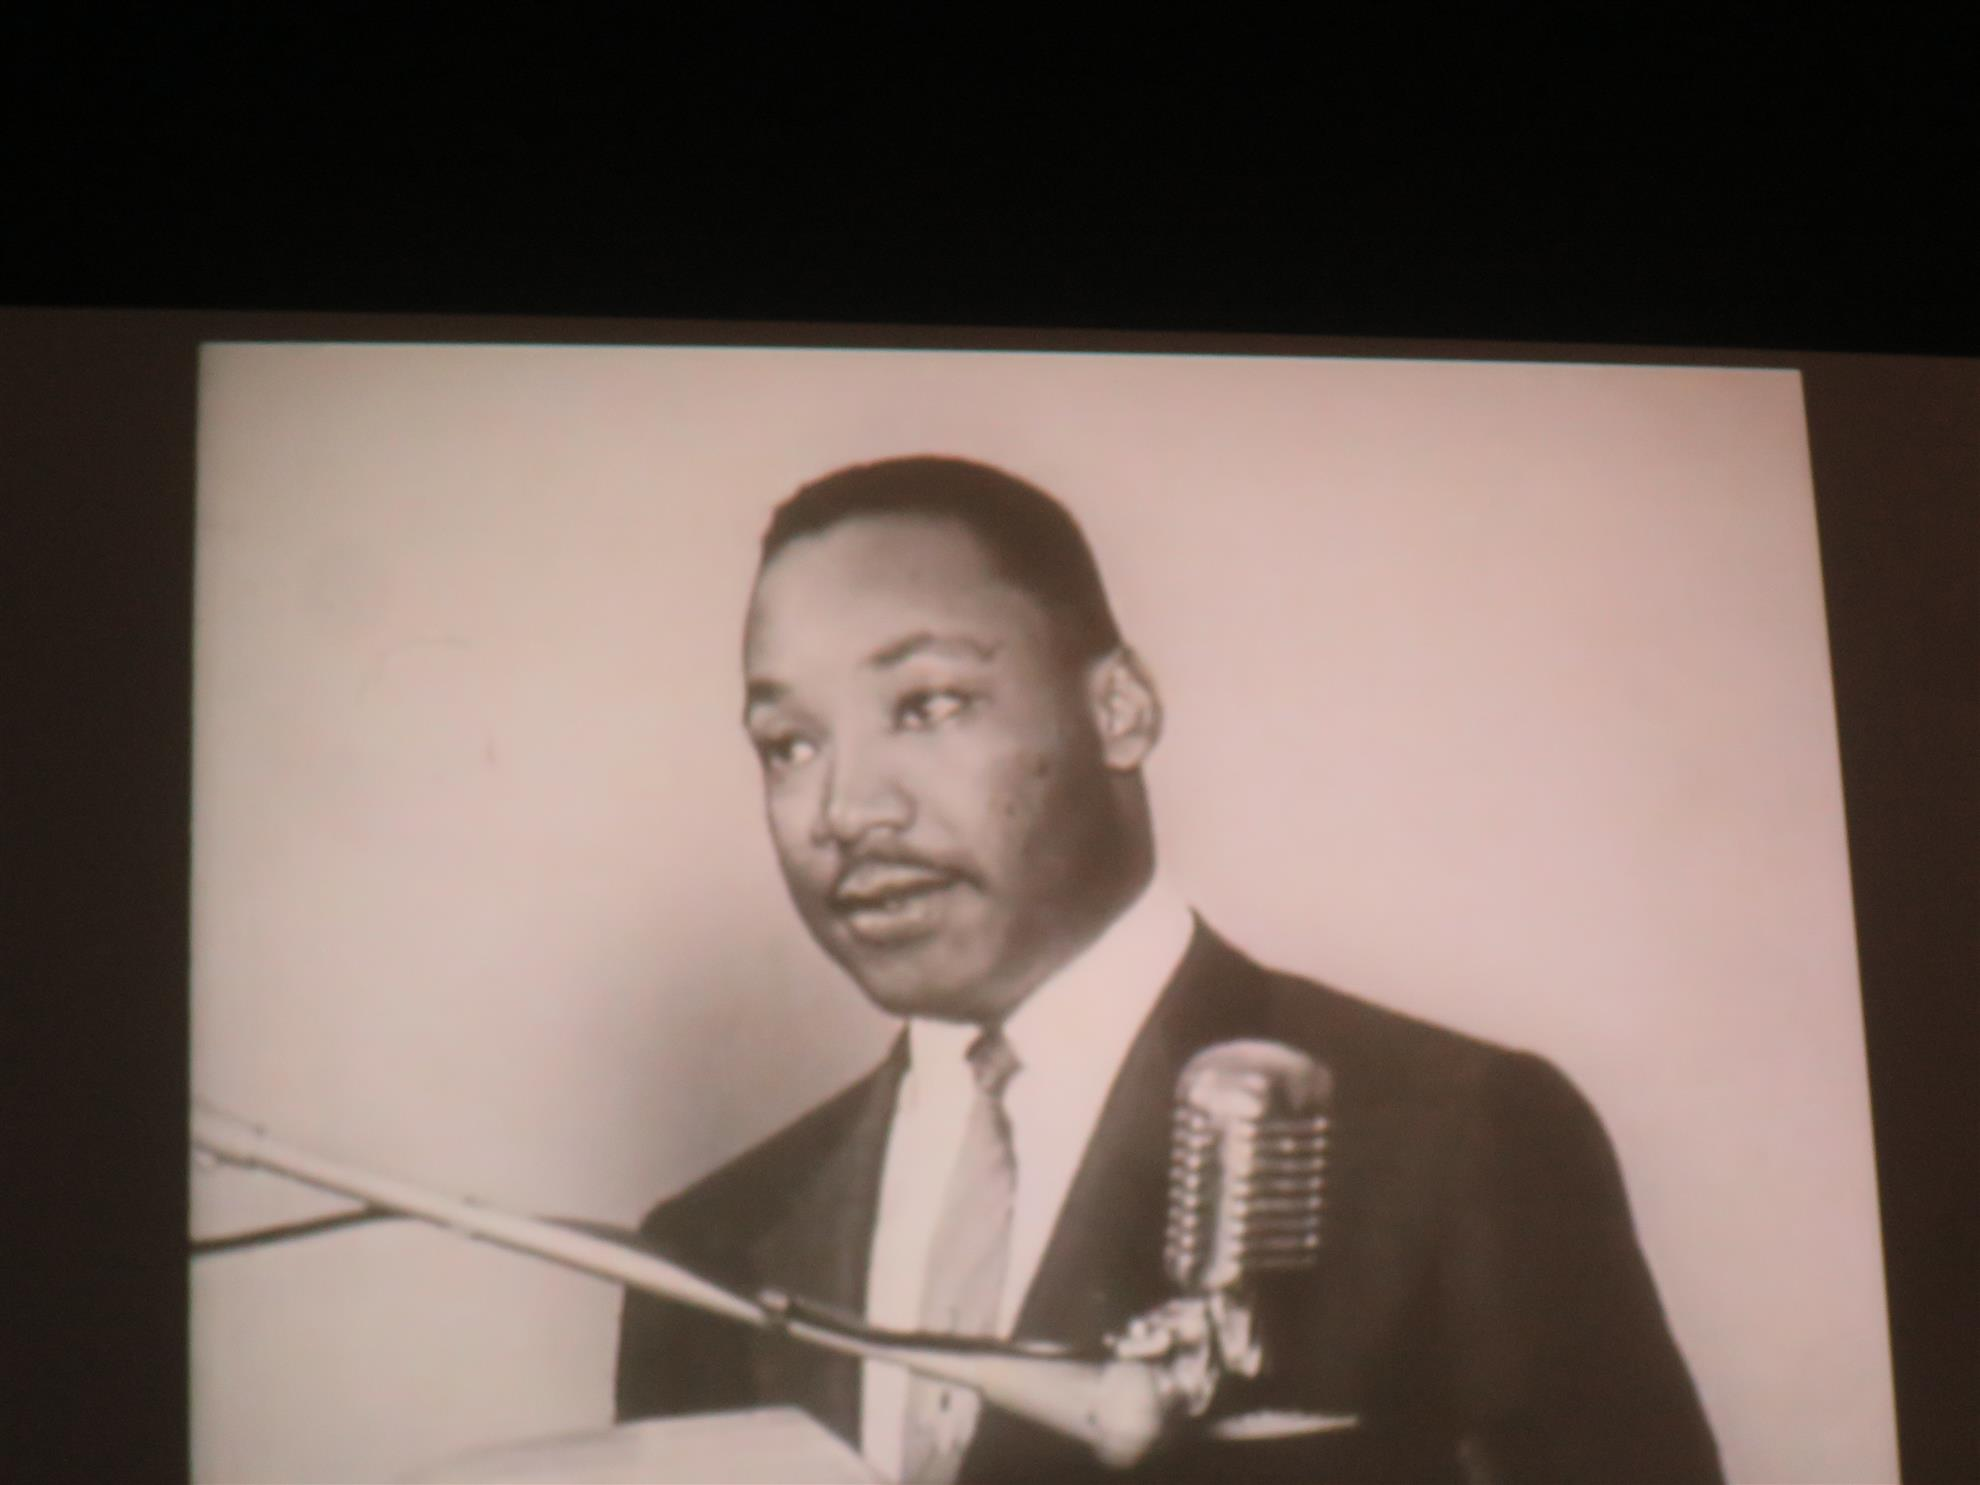 Foghorn January 17 2019 Honoring Dr Martin Luther King Jr